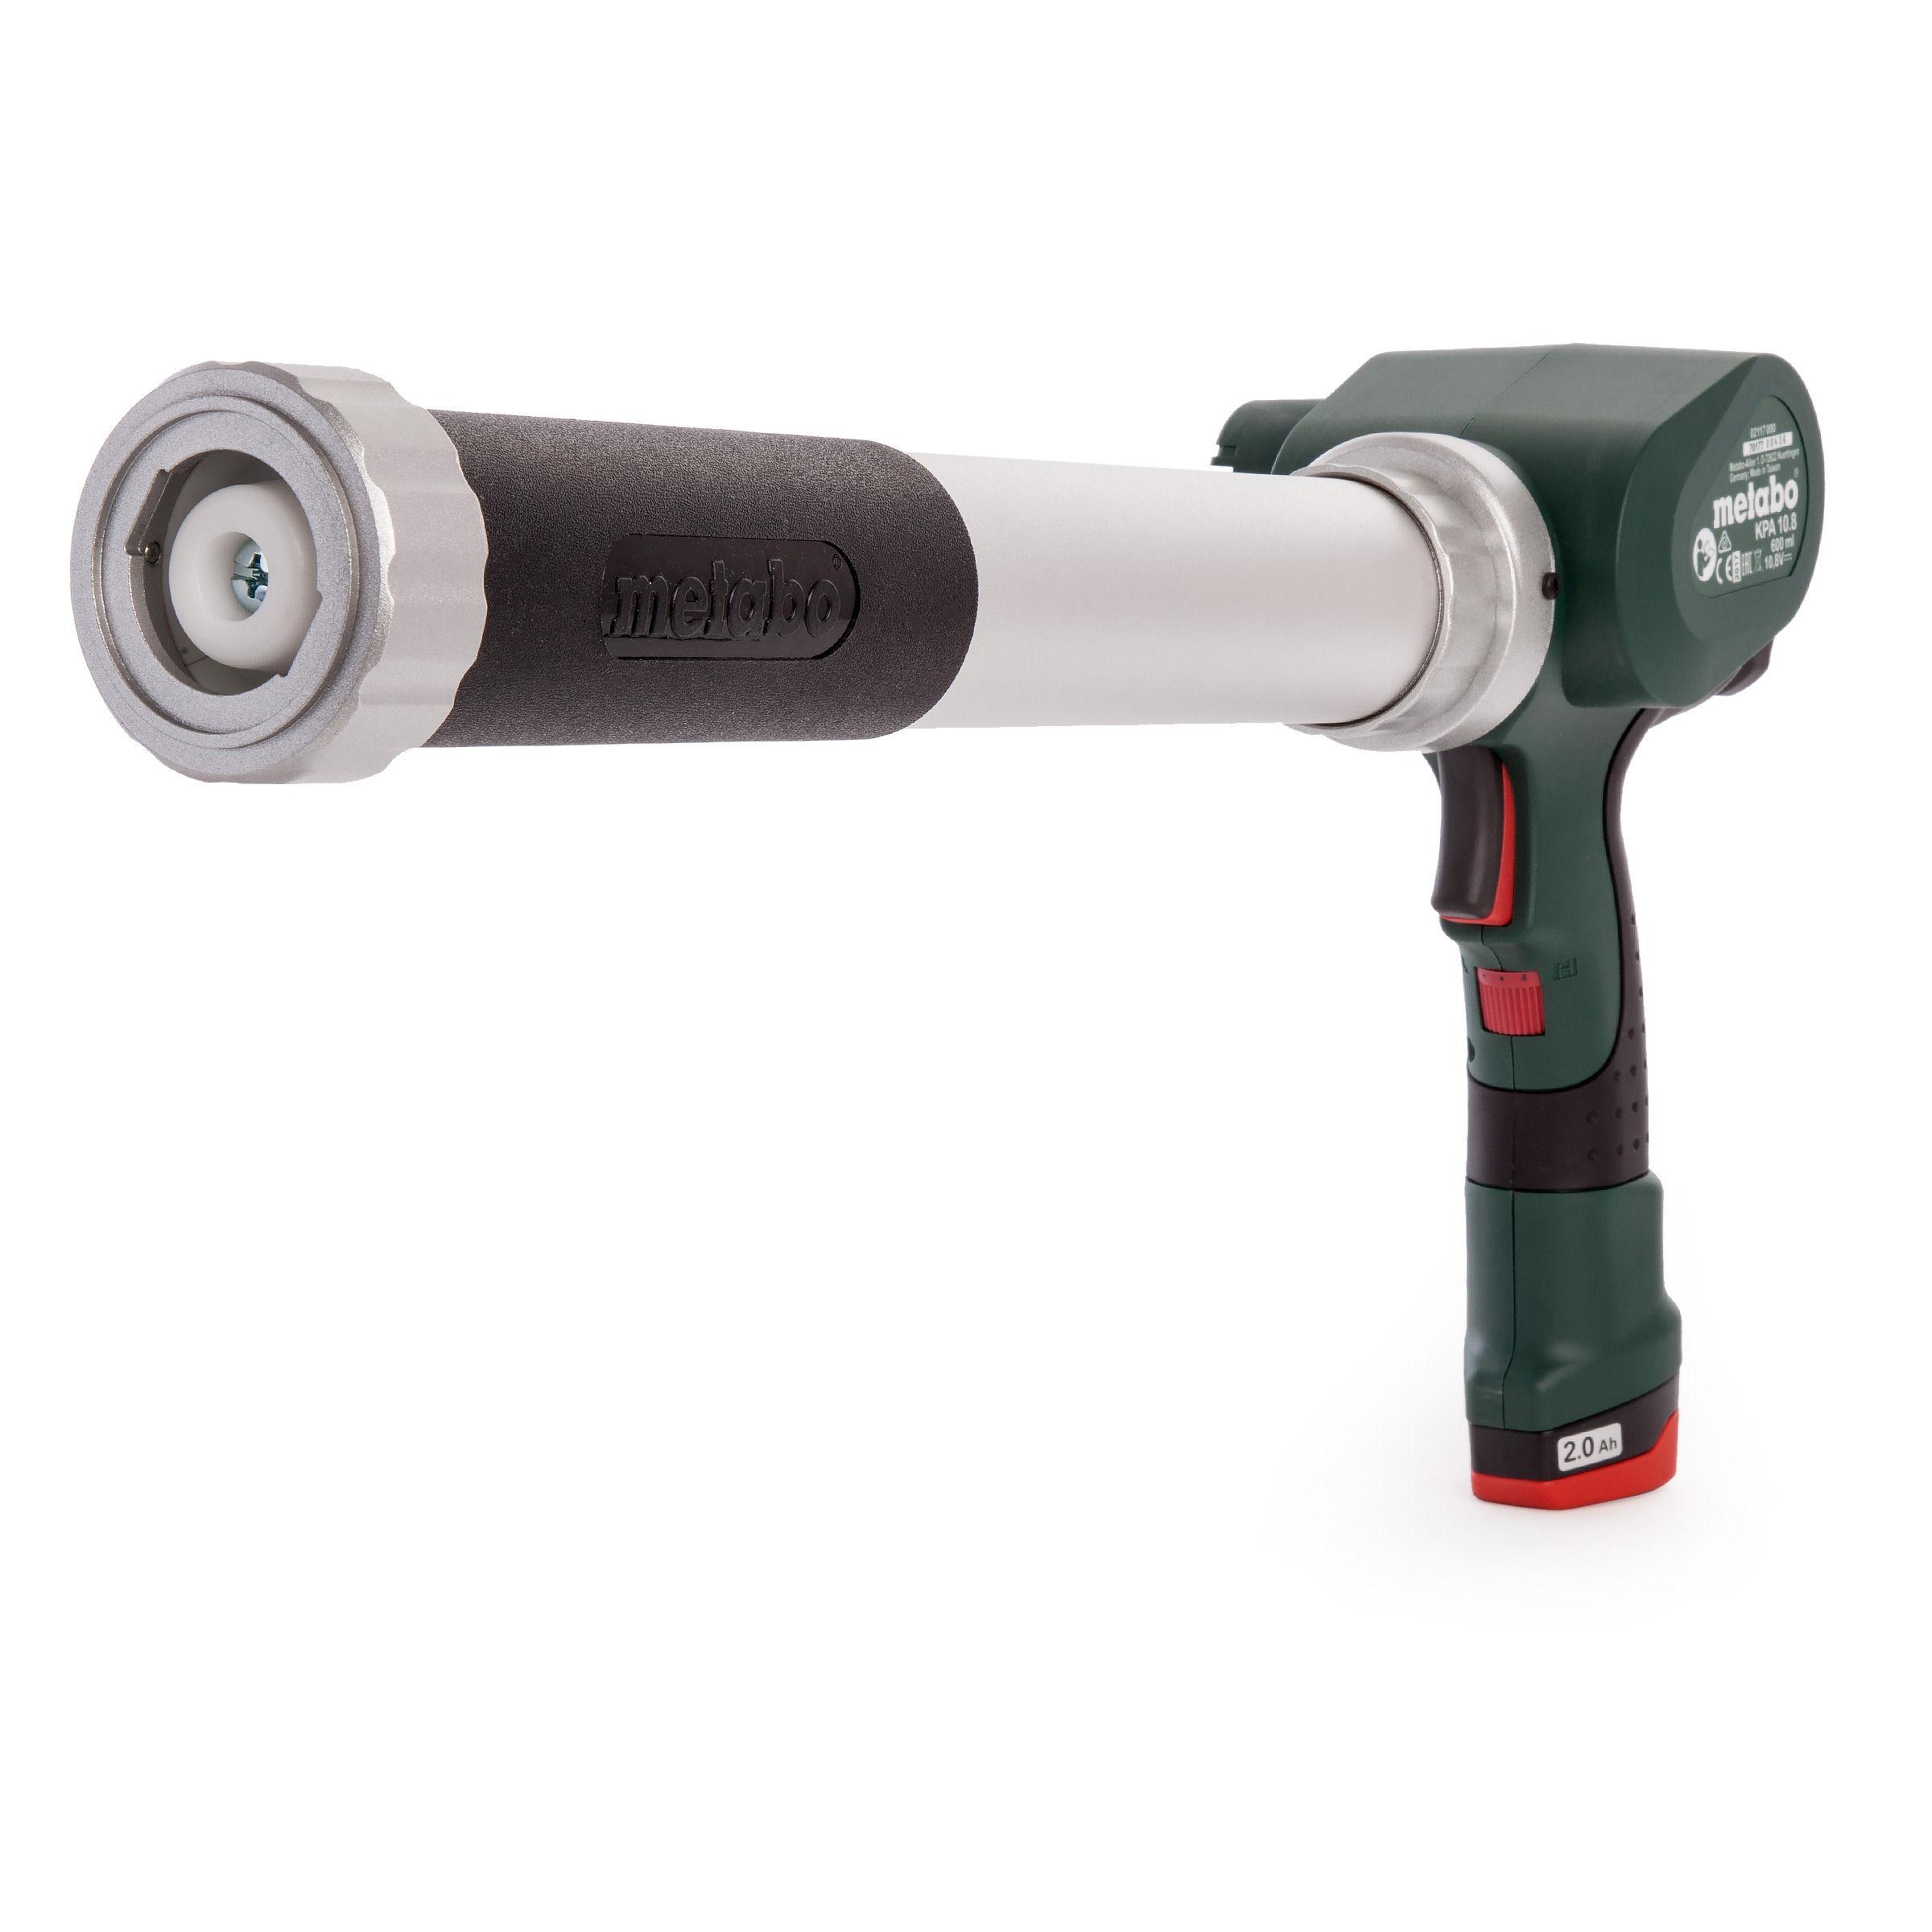 Tools & Electrical Tools Metabo KPA 10.8 600 Cordless 10.8V Caulking Gun (1 x 2.0Ah Battery)